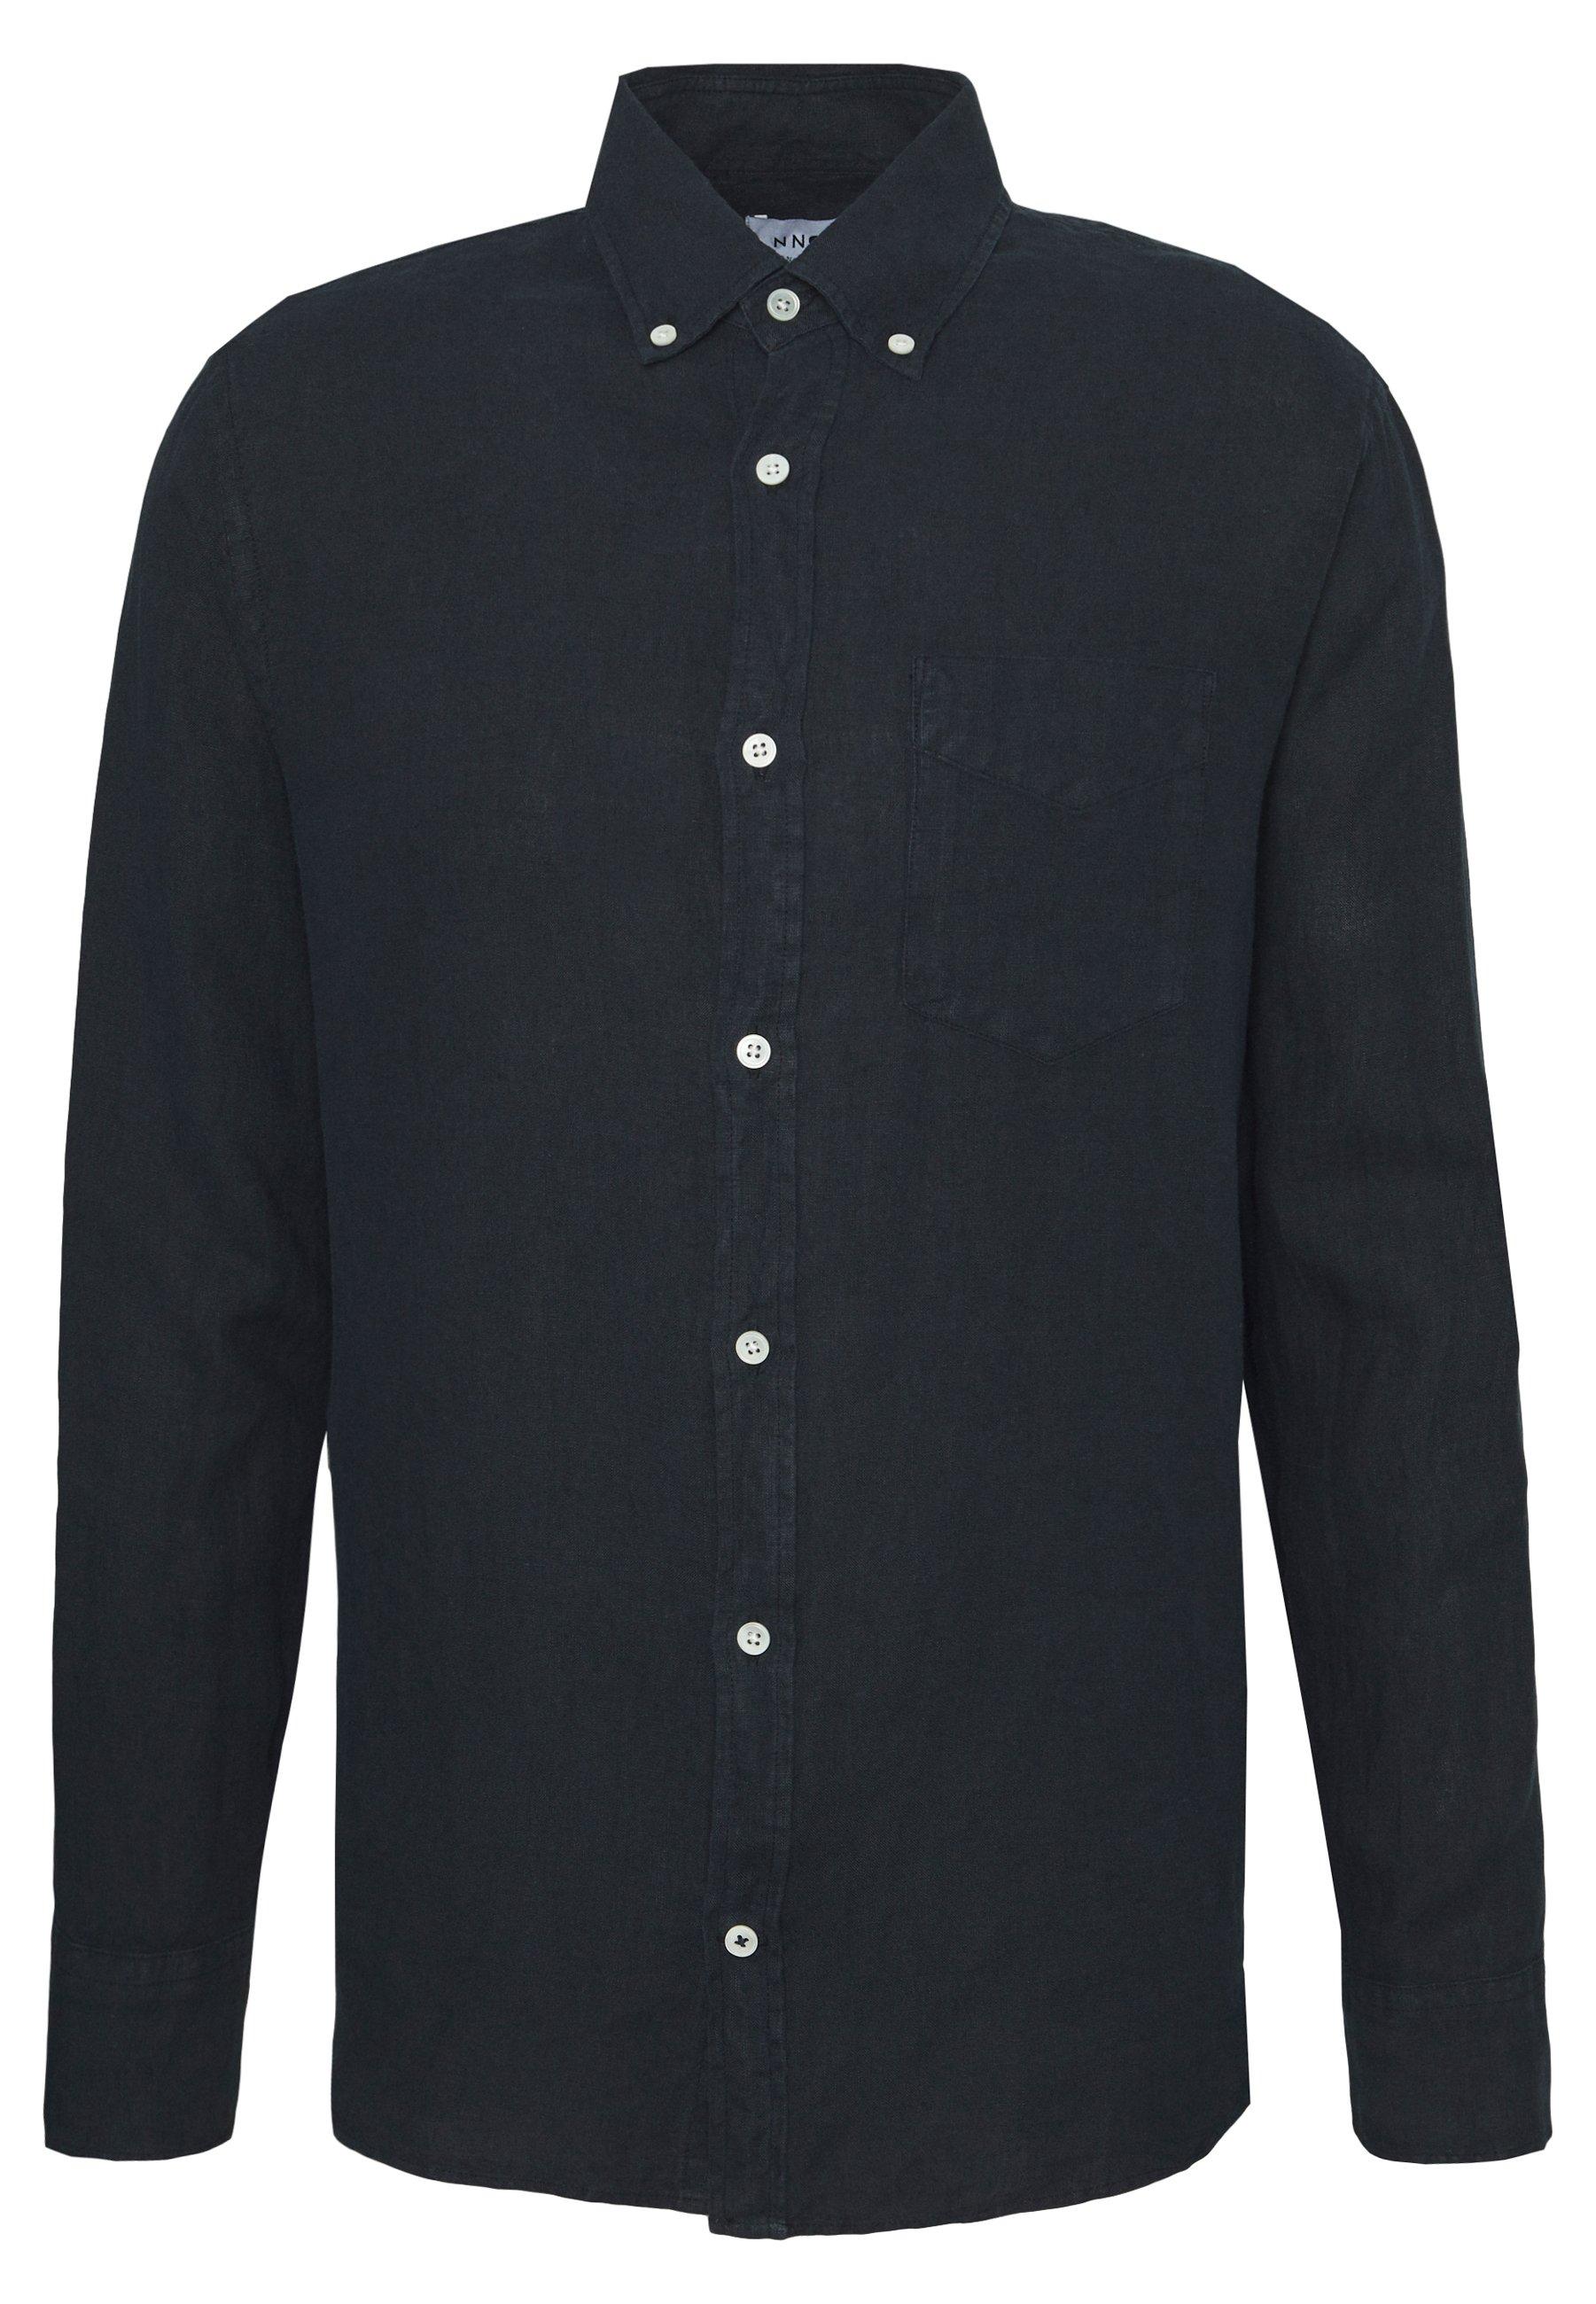 Nn07 Levon - Hemd Blue Black Friday